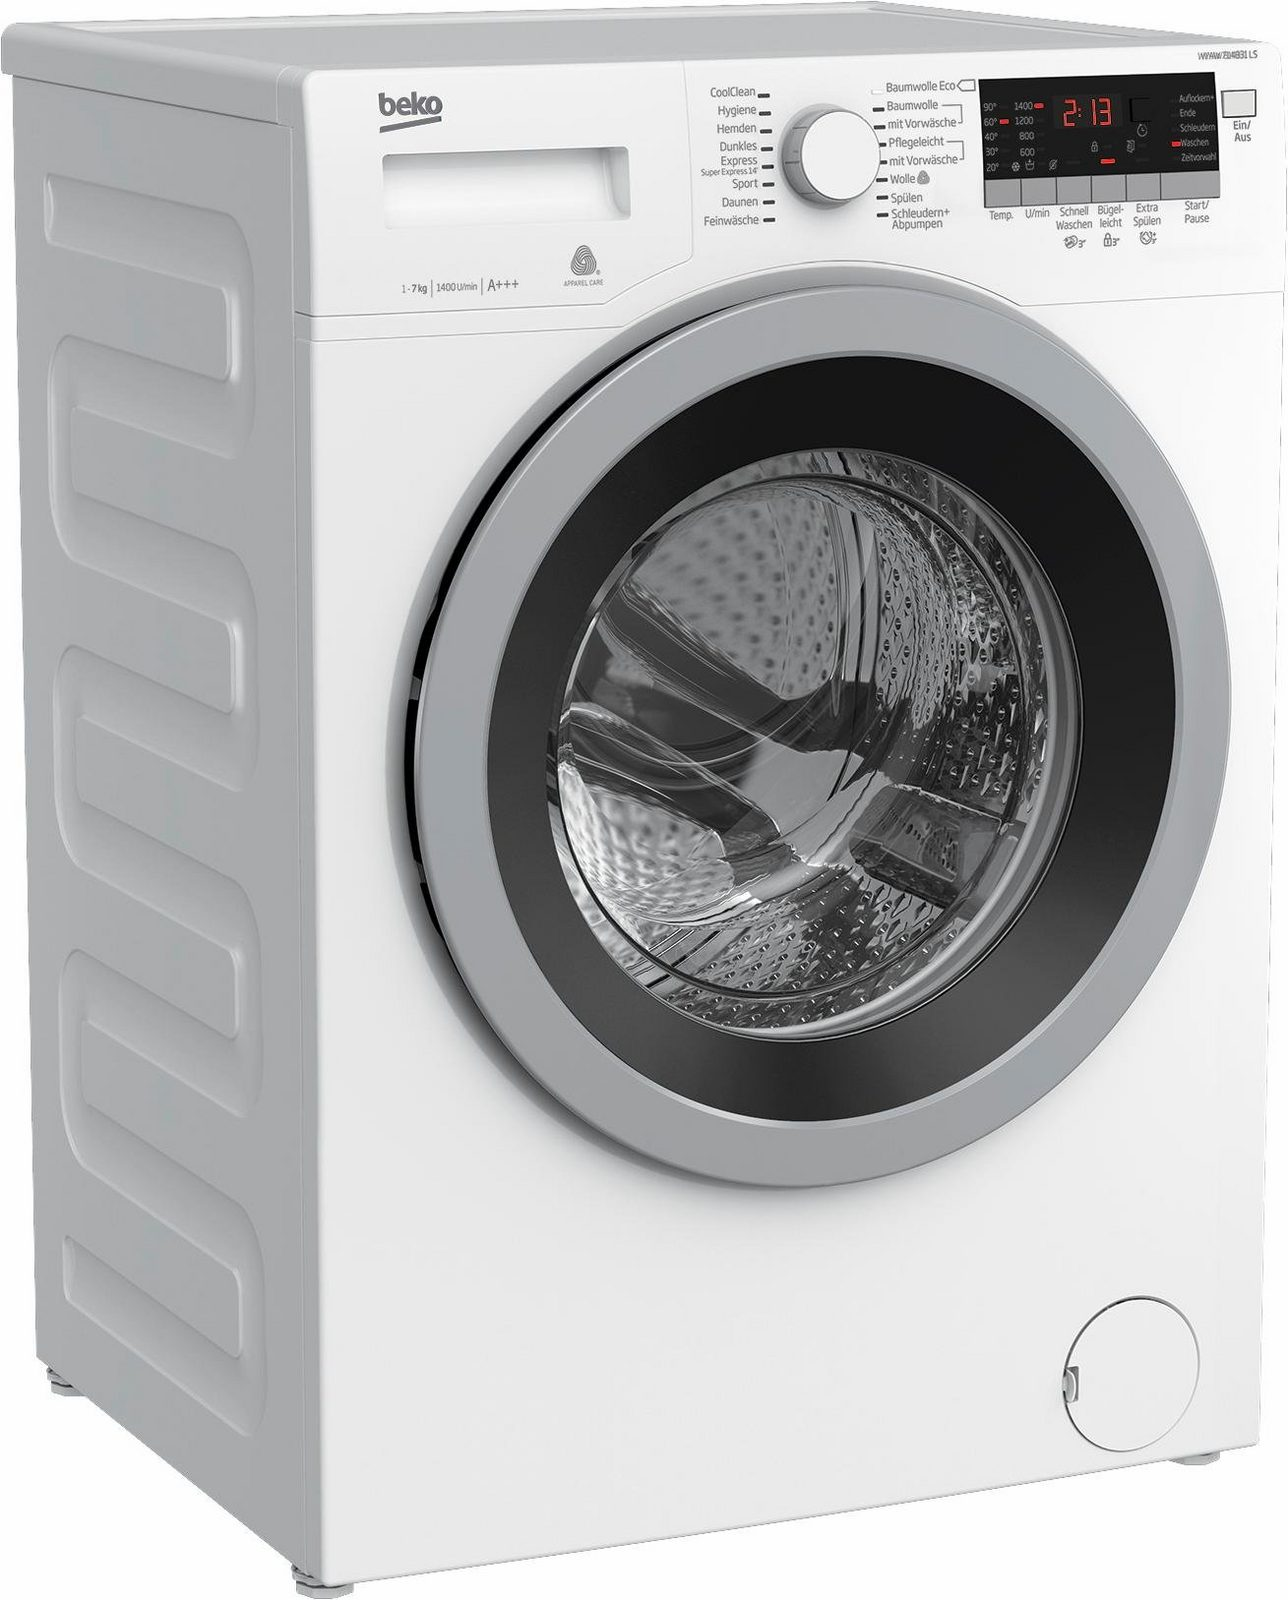 BEKO Waschmaschine WYAW 714831 LS, A+++, 7 kg, 1400 U/Min - broschei